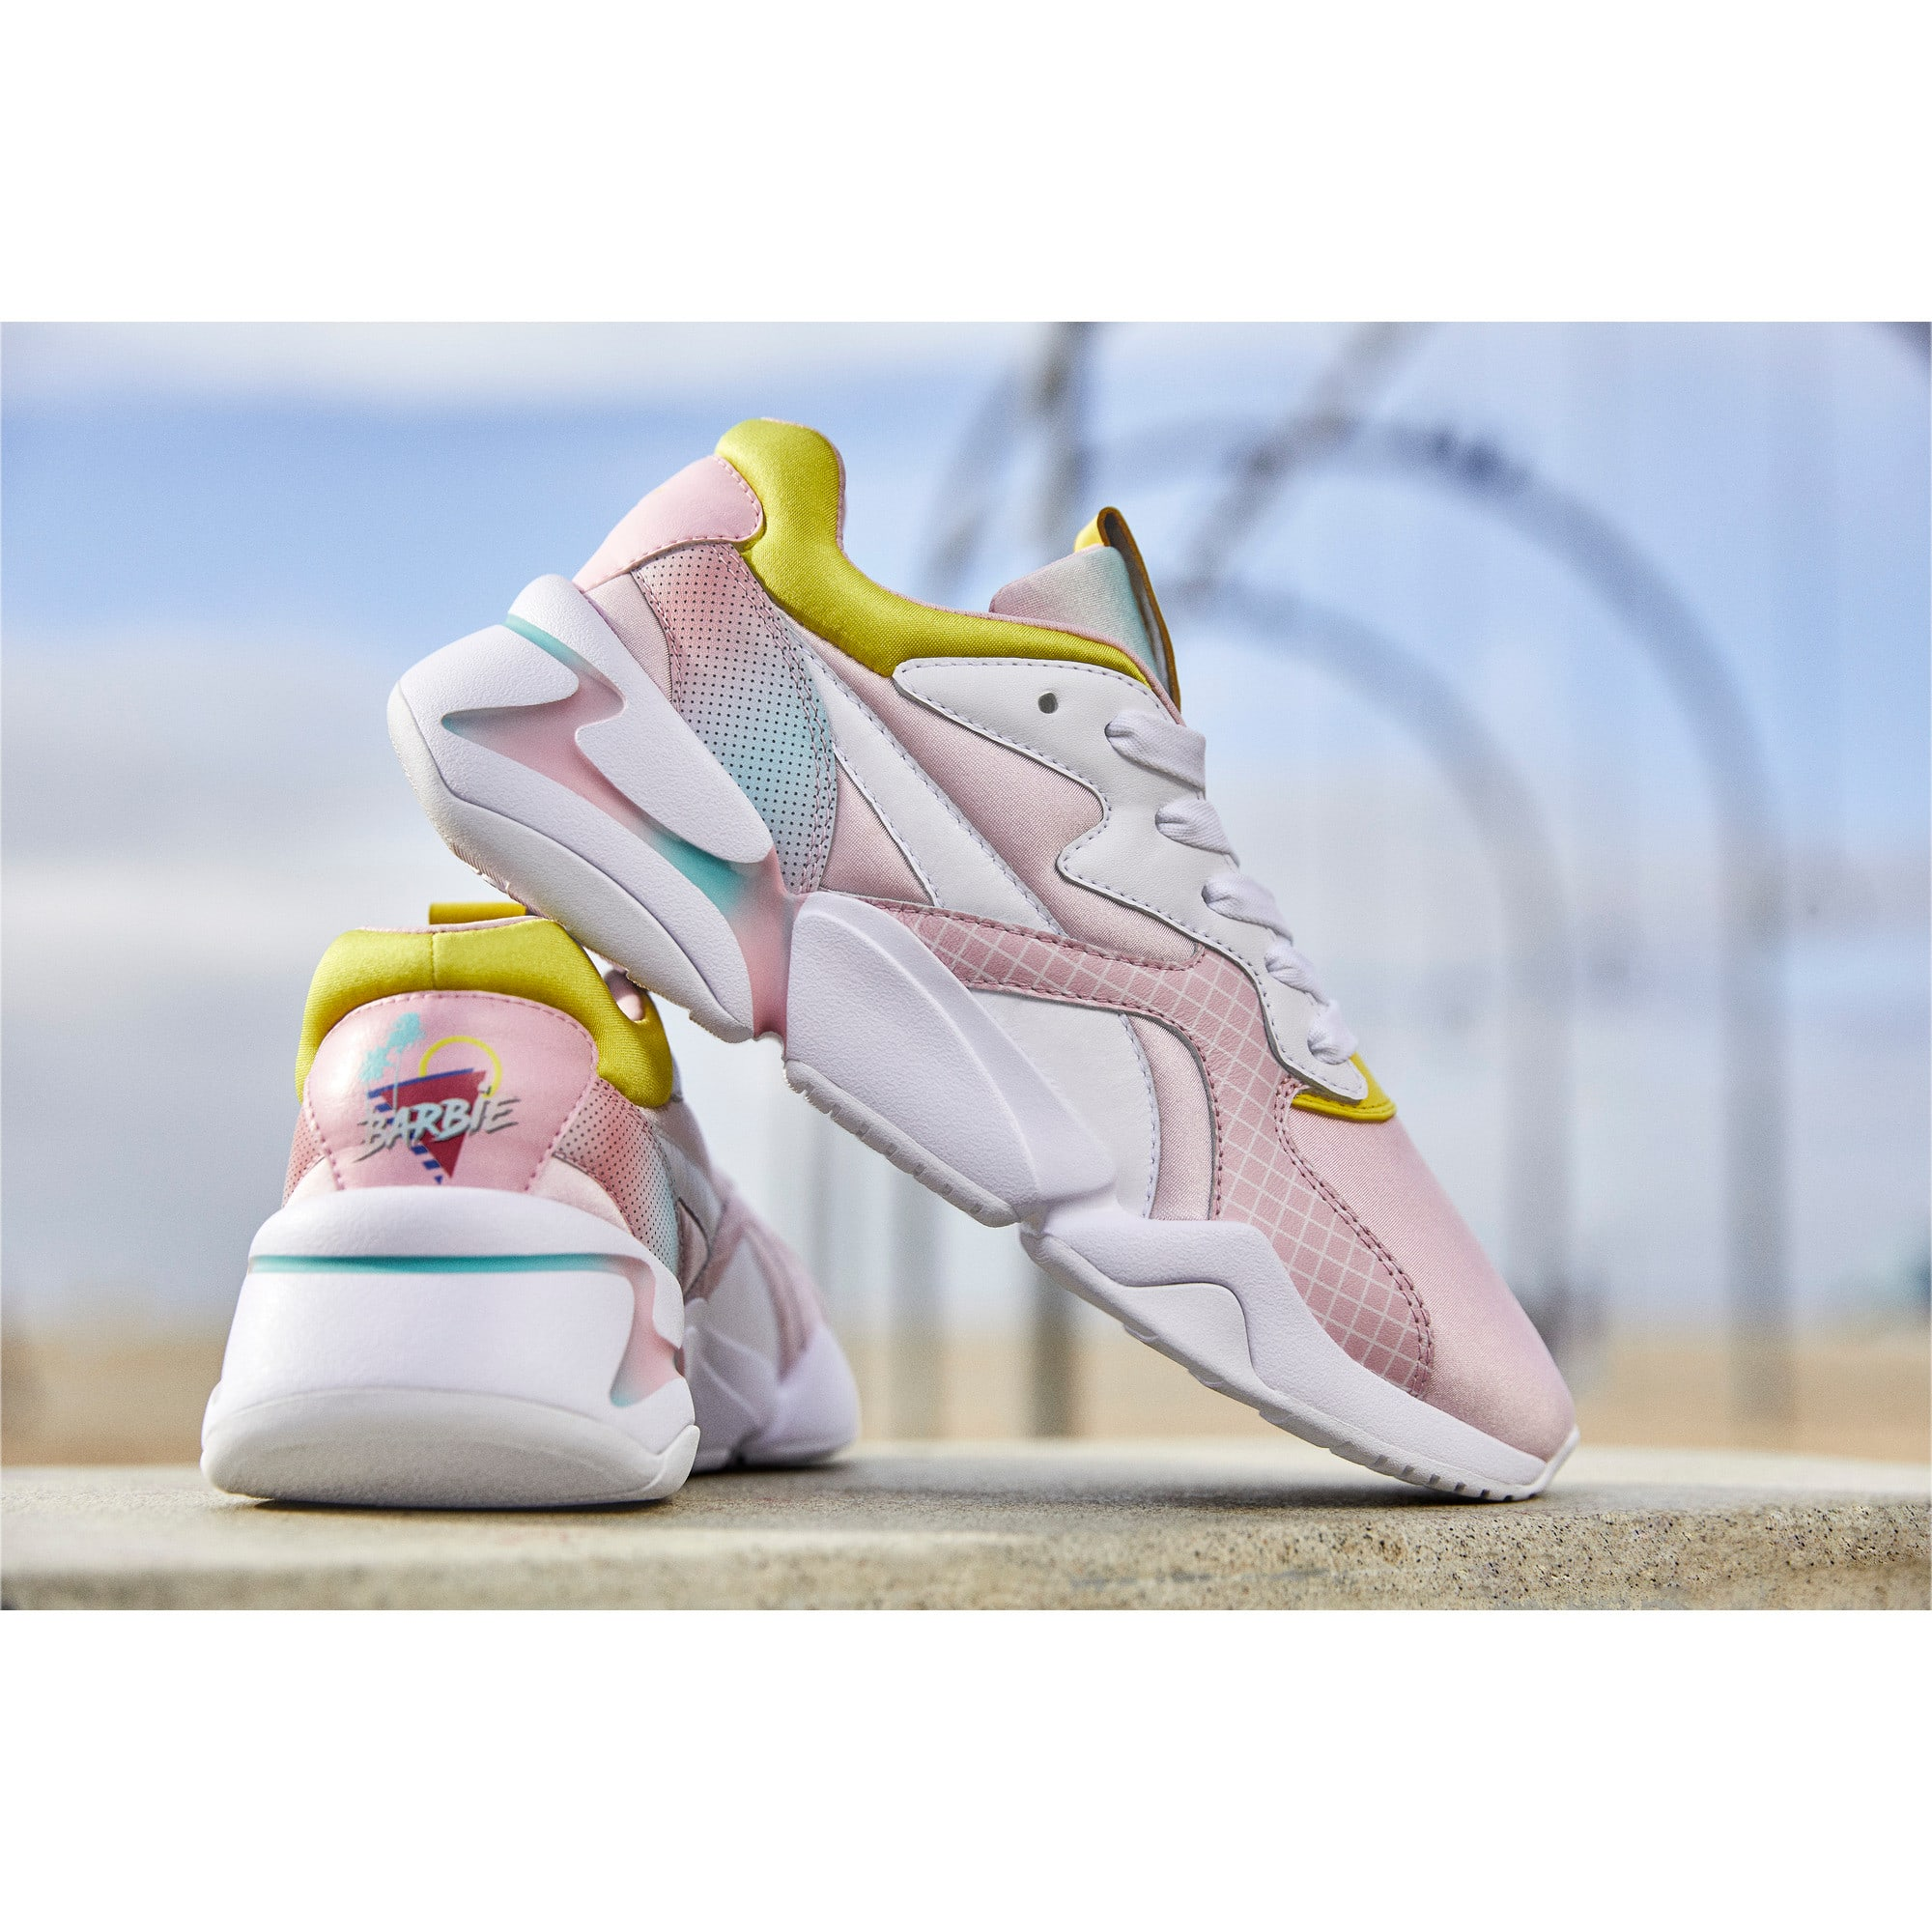 Thumbnail 8 of Nova x Barbie Little Kids' Shoes, Orchid Pink-Puma White, medium